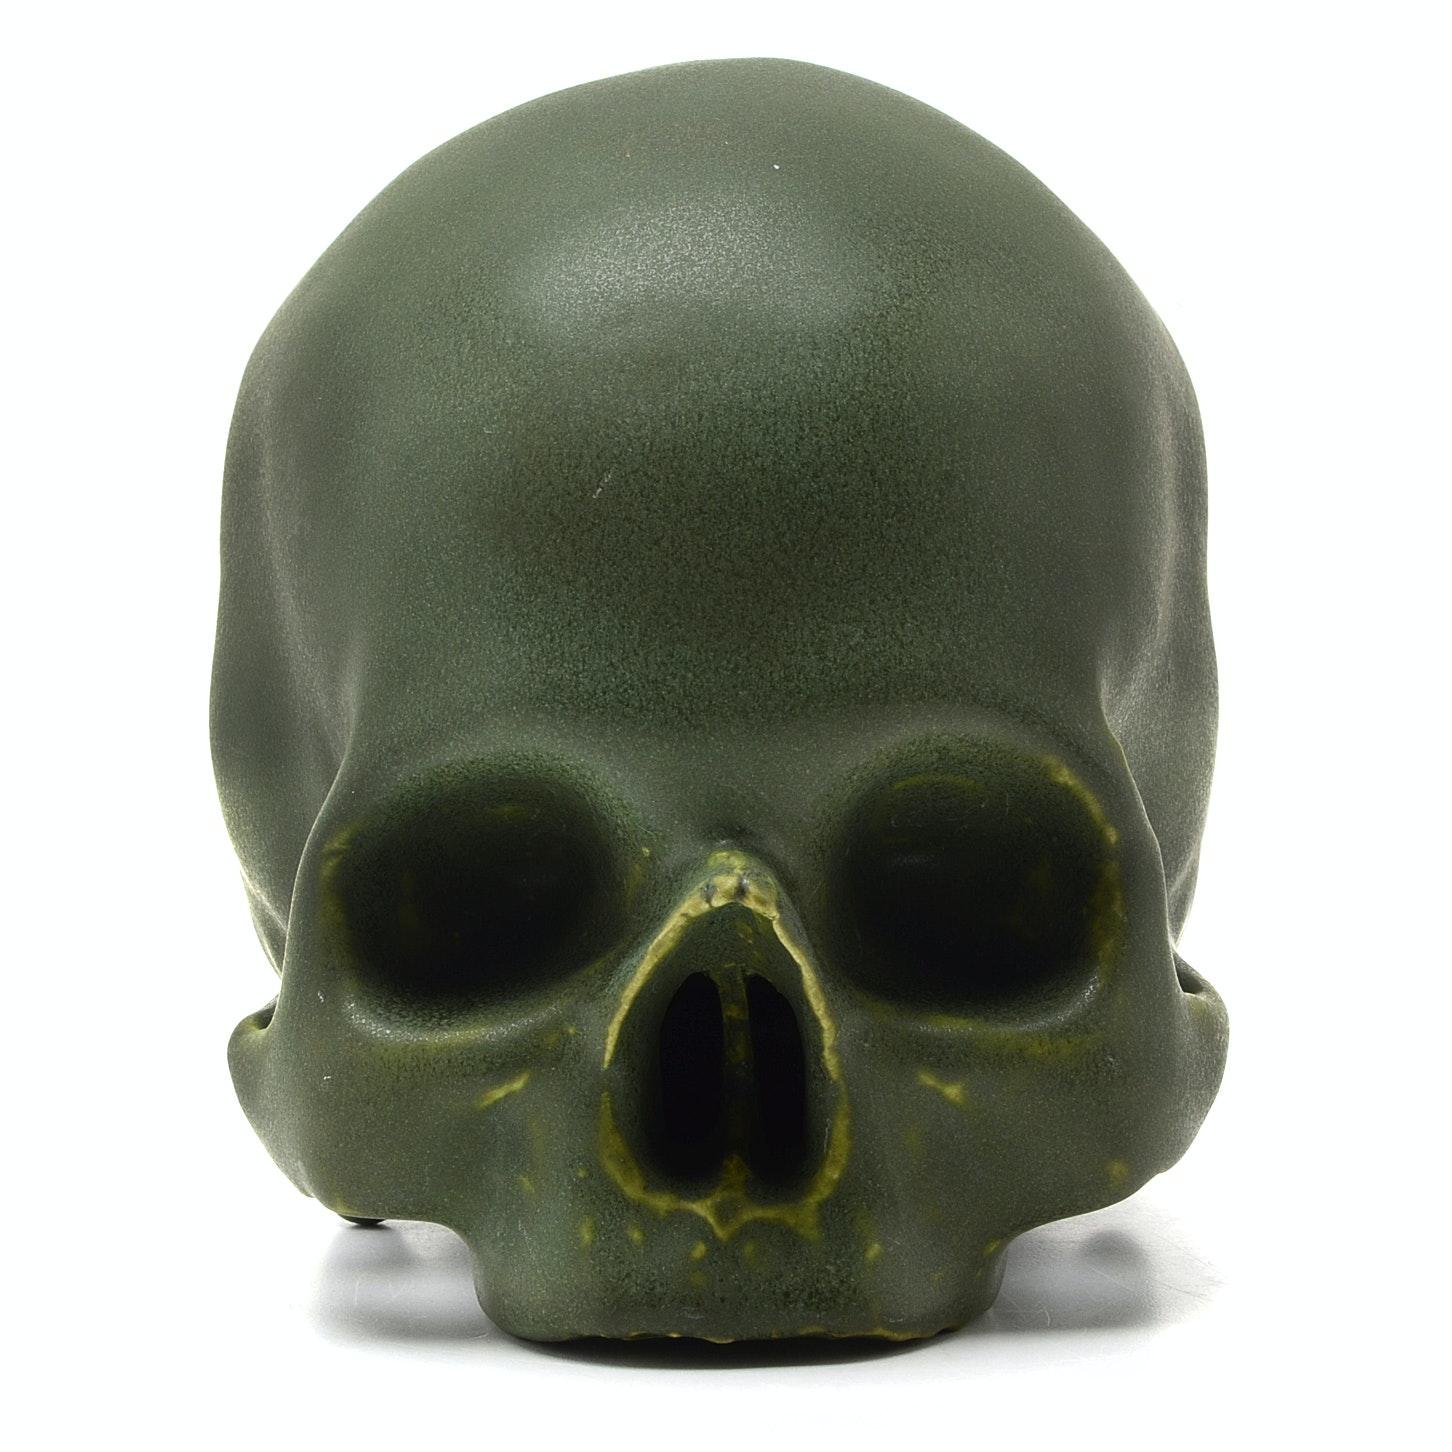 Vintage Memento Mori Glazed Pottery Skull